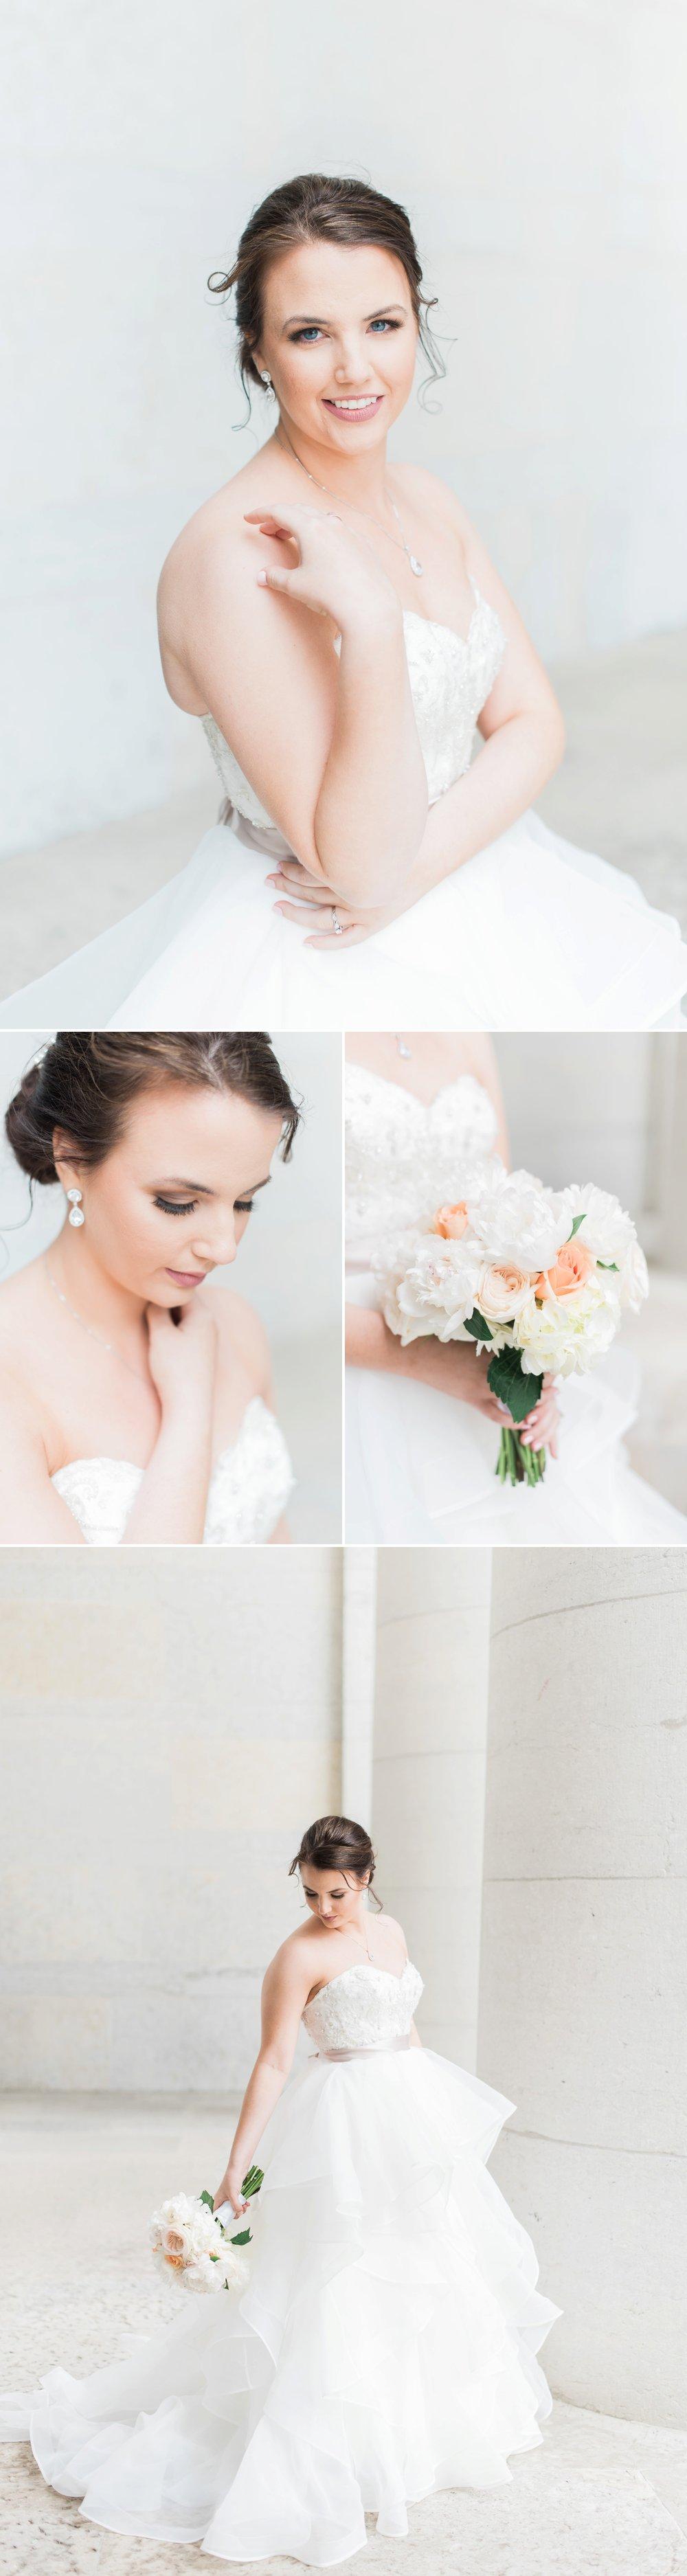 the-vault-columbus-ohio-wedding-emily-chris_0020.jpg